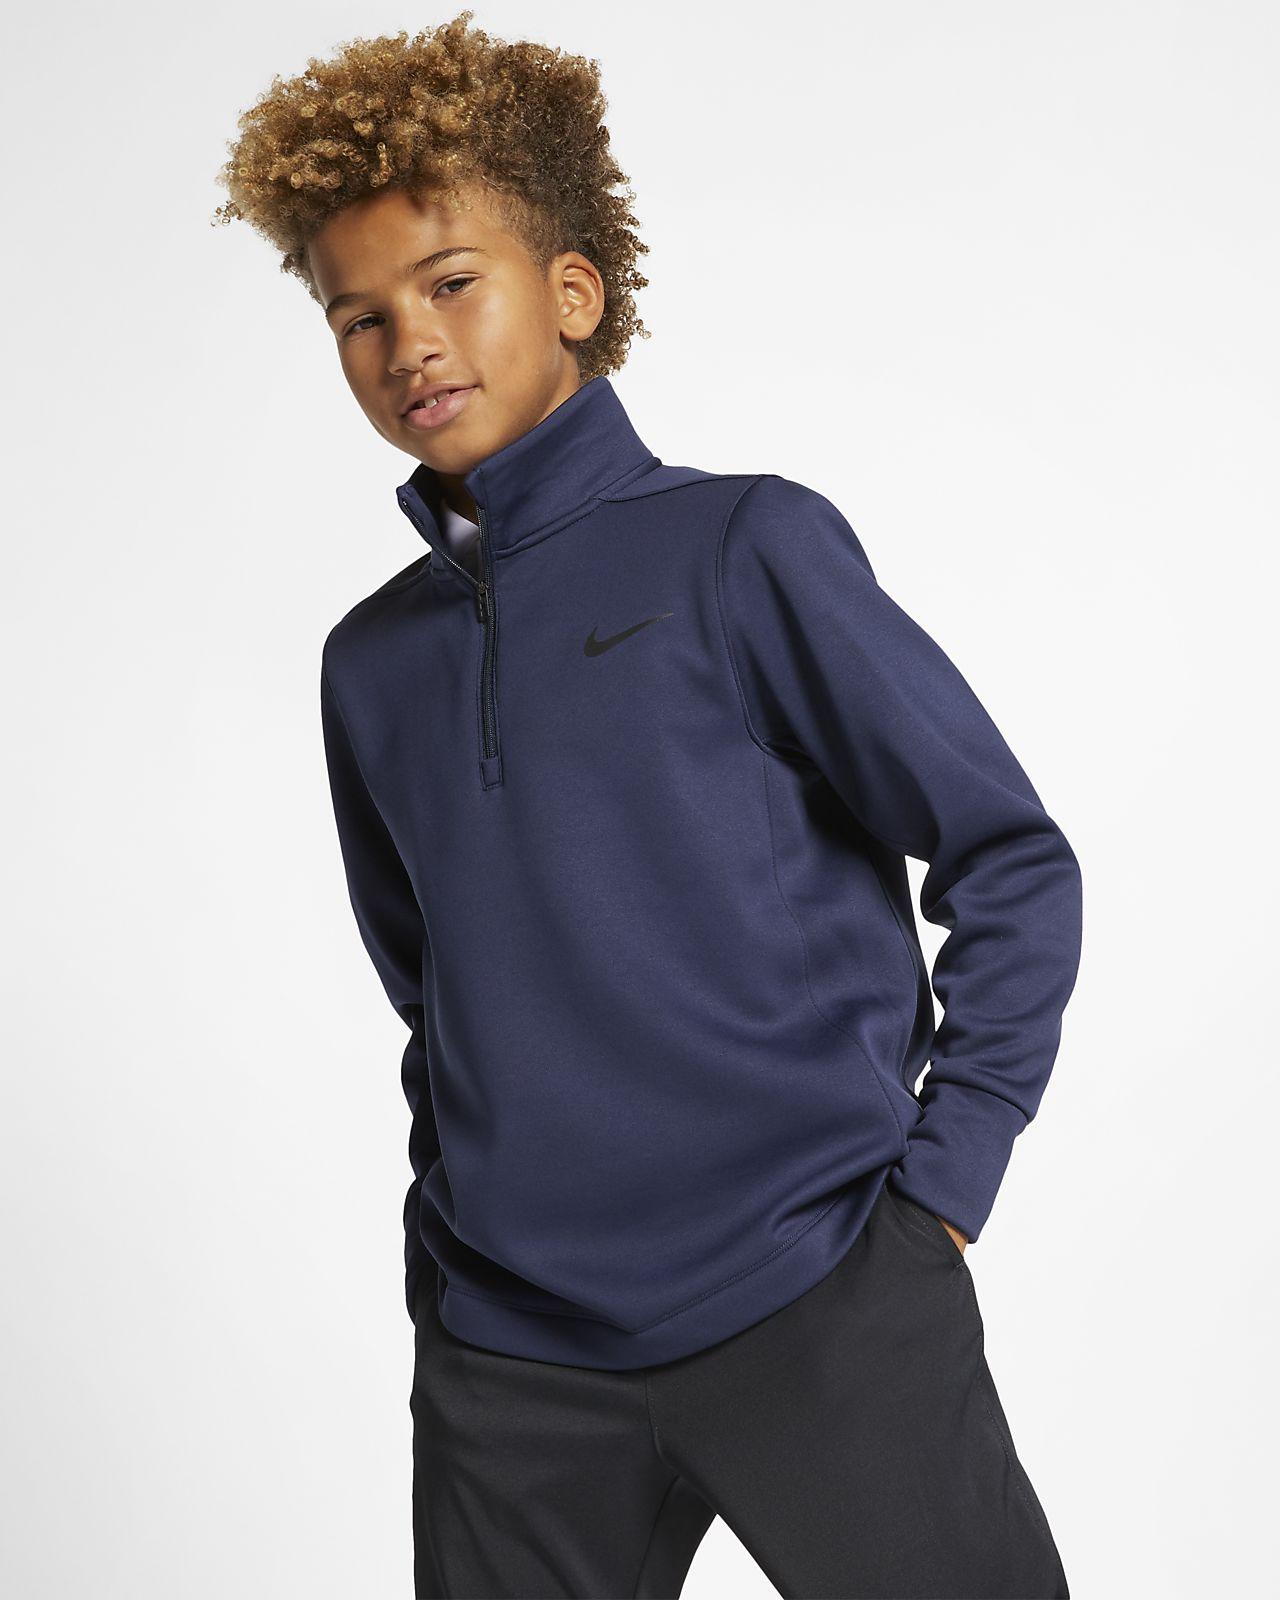 Nike Dri-FIT Therma Camiseta de golf con media cremallera - Niño